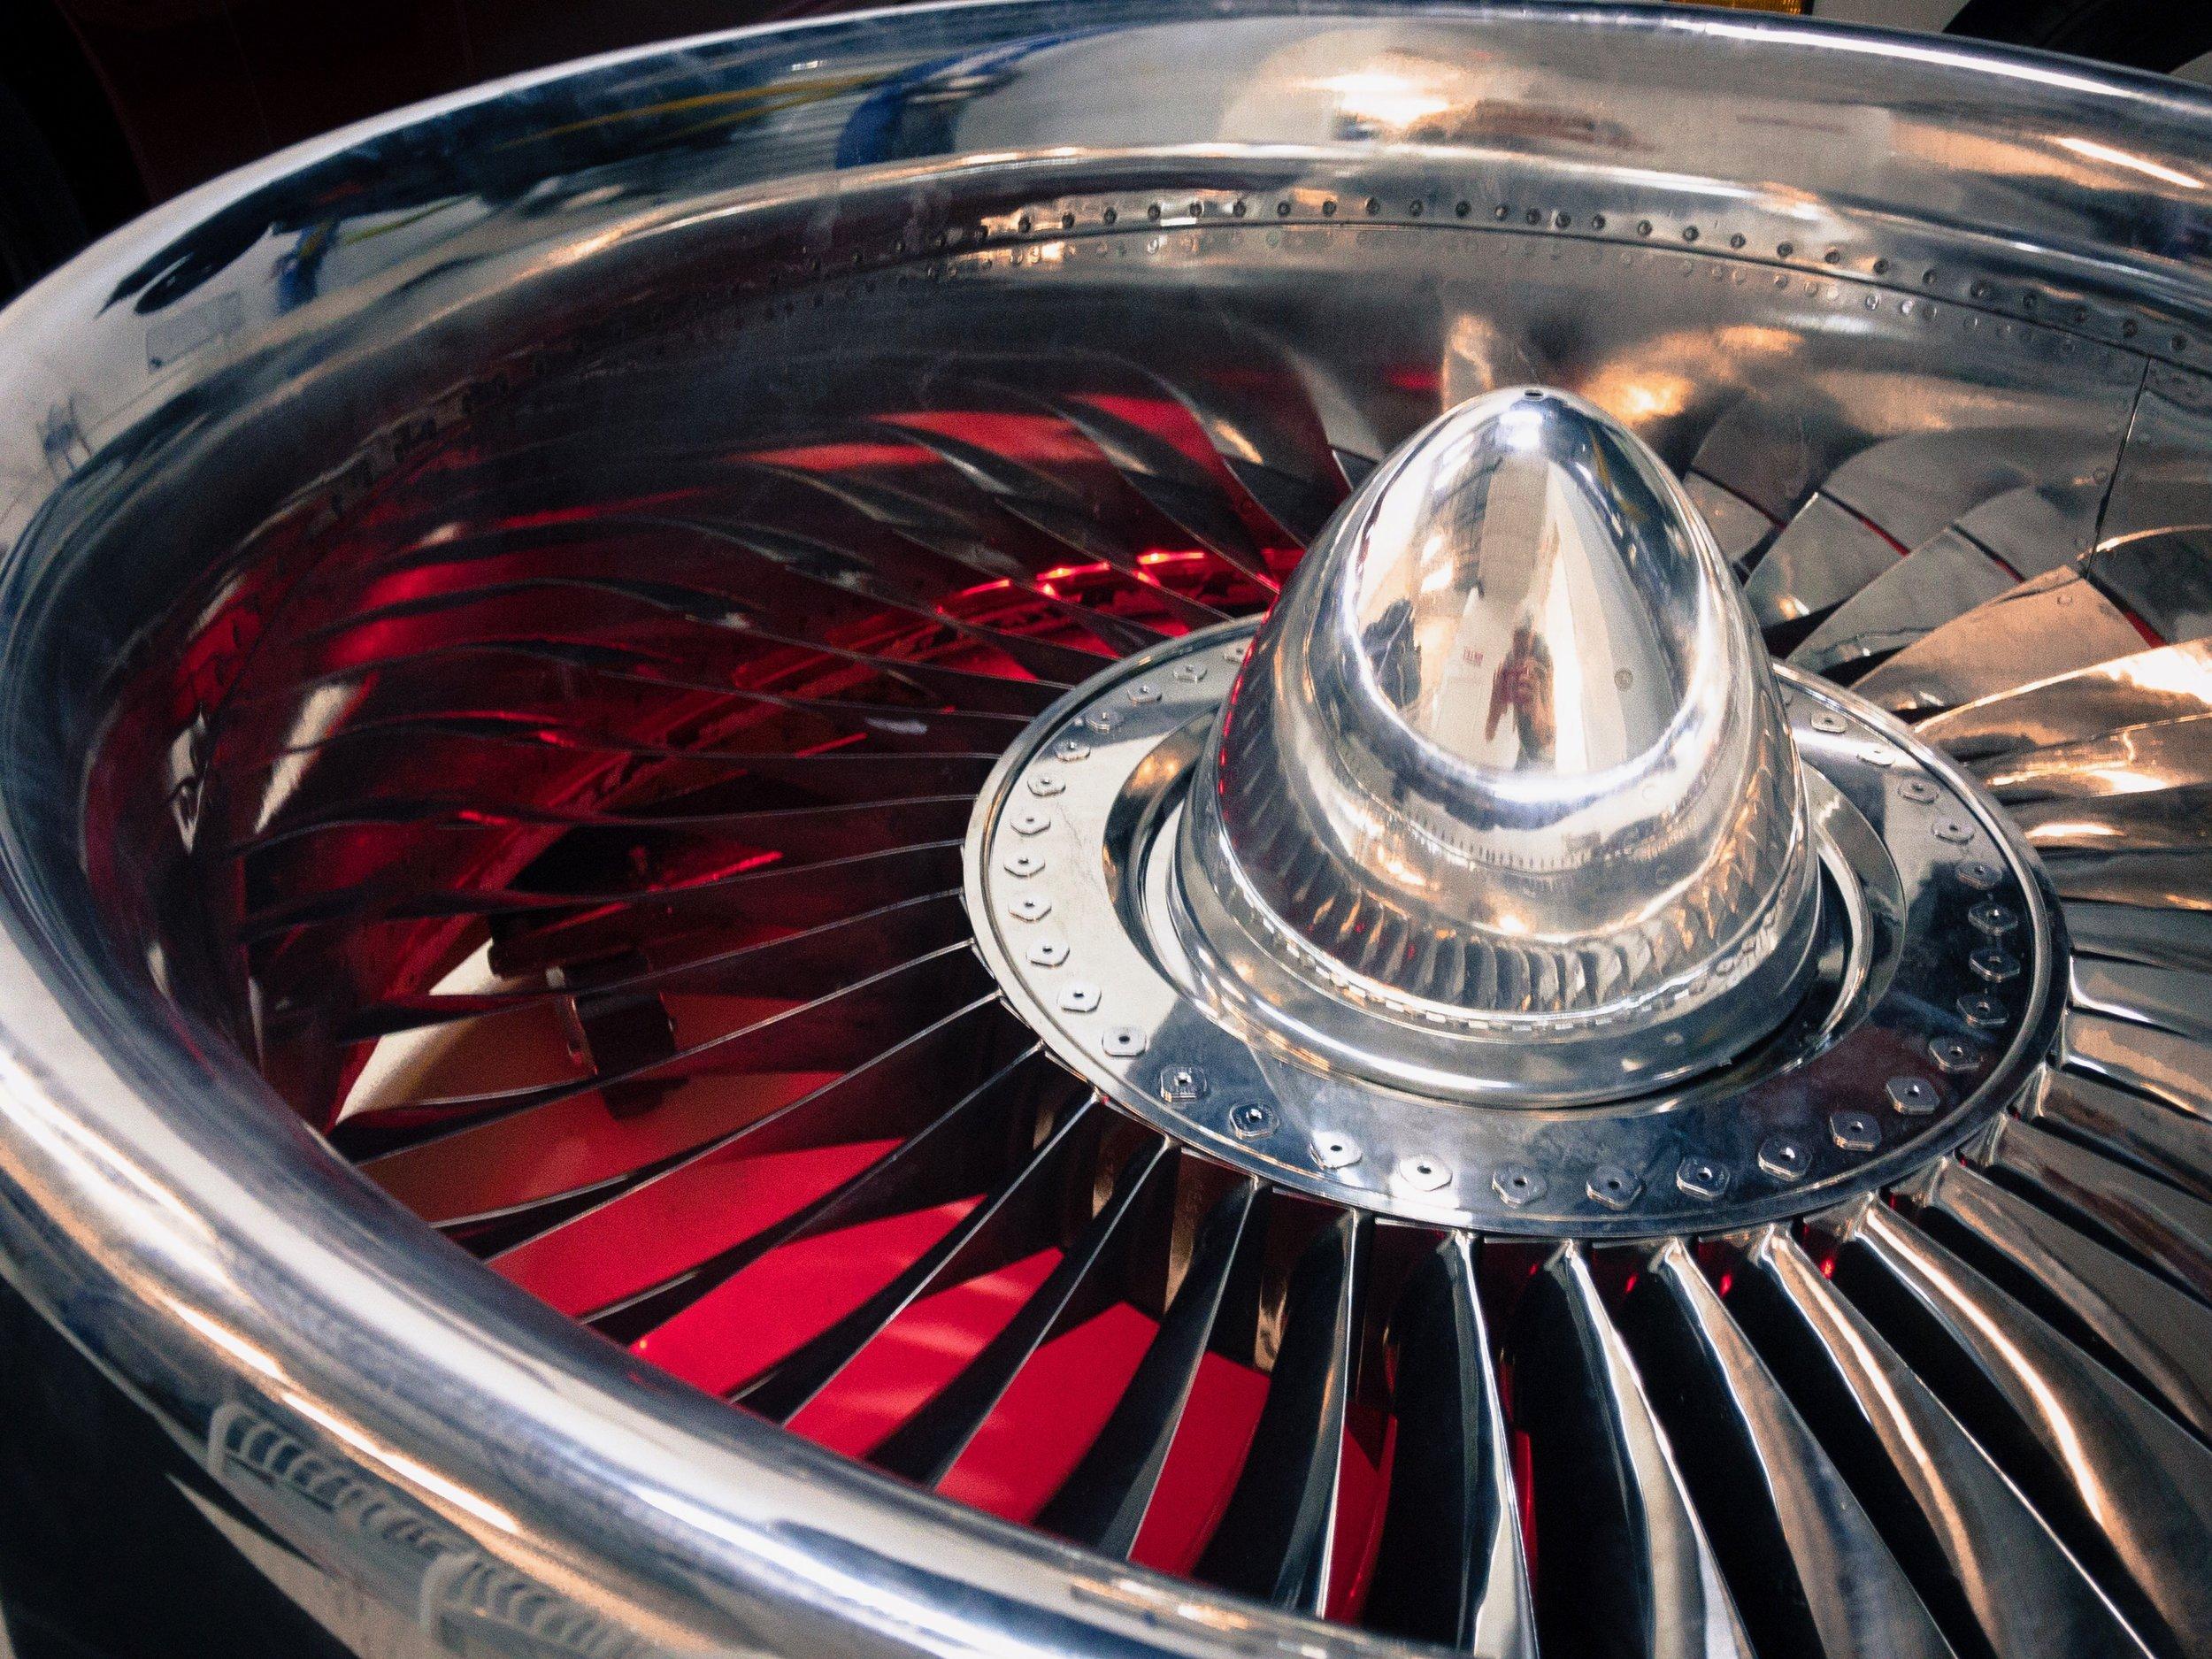 Red_Boeing 737 Jet Engine Coffee Table-1.JPG